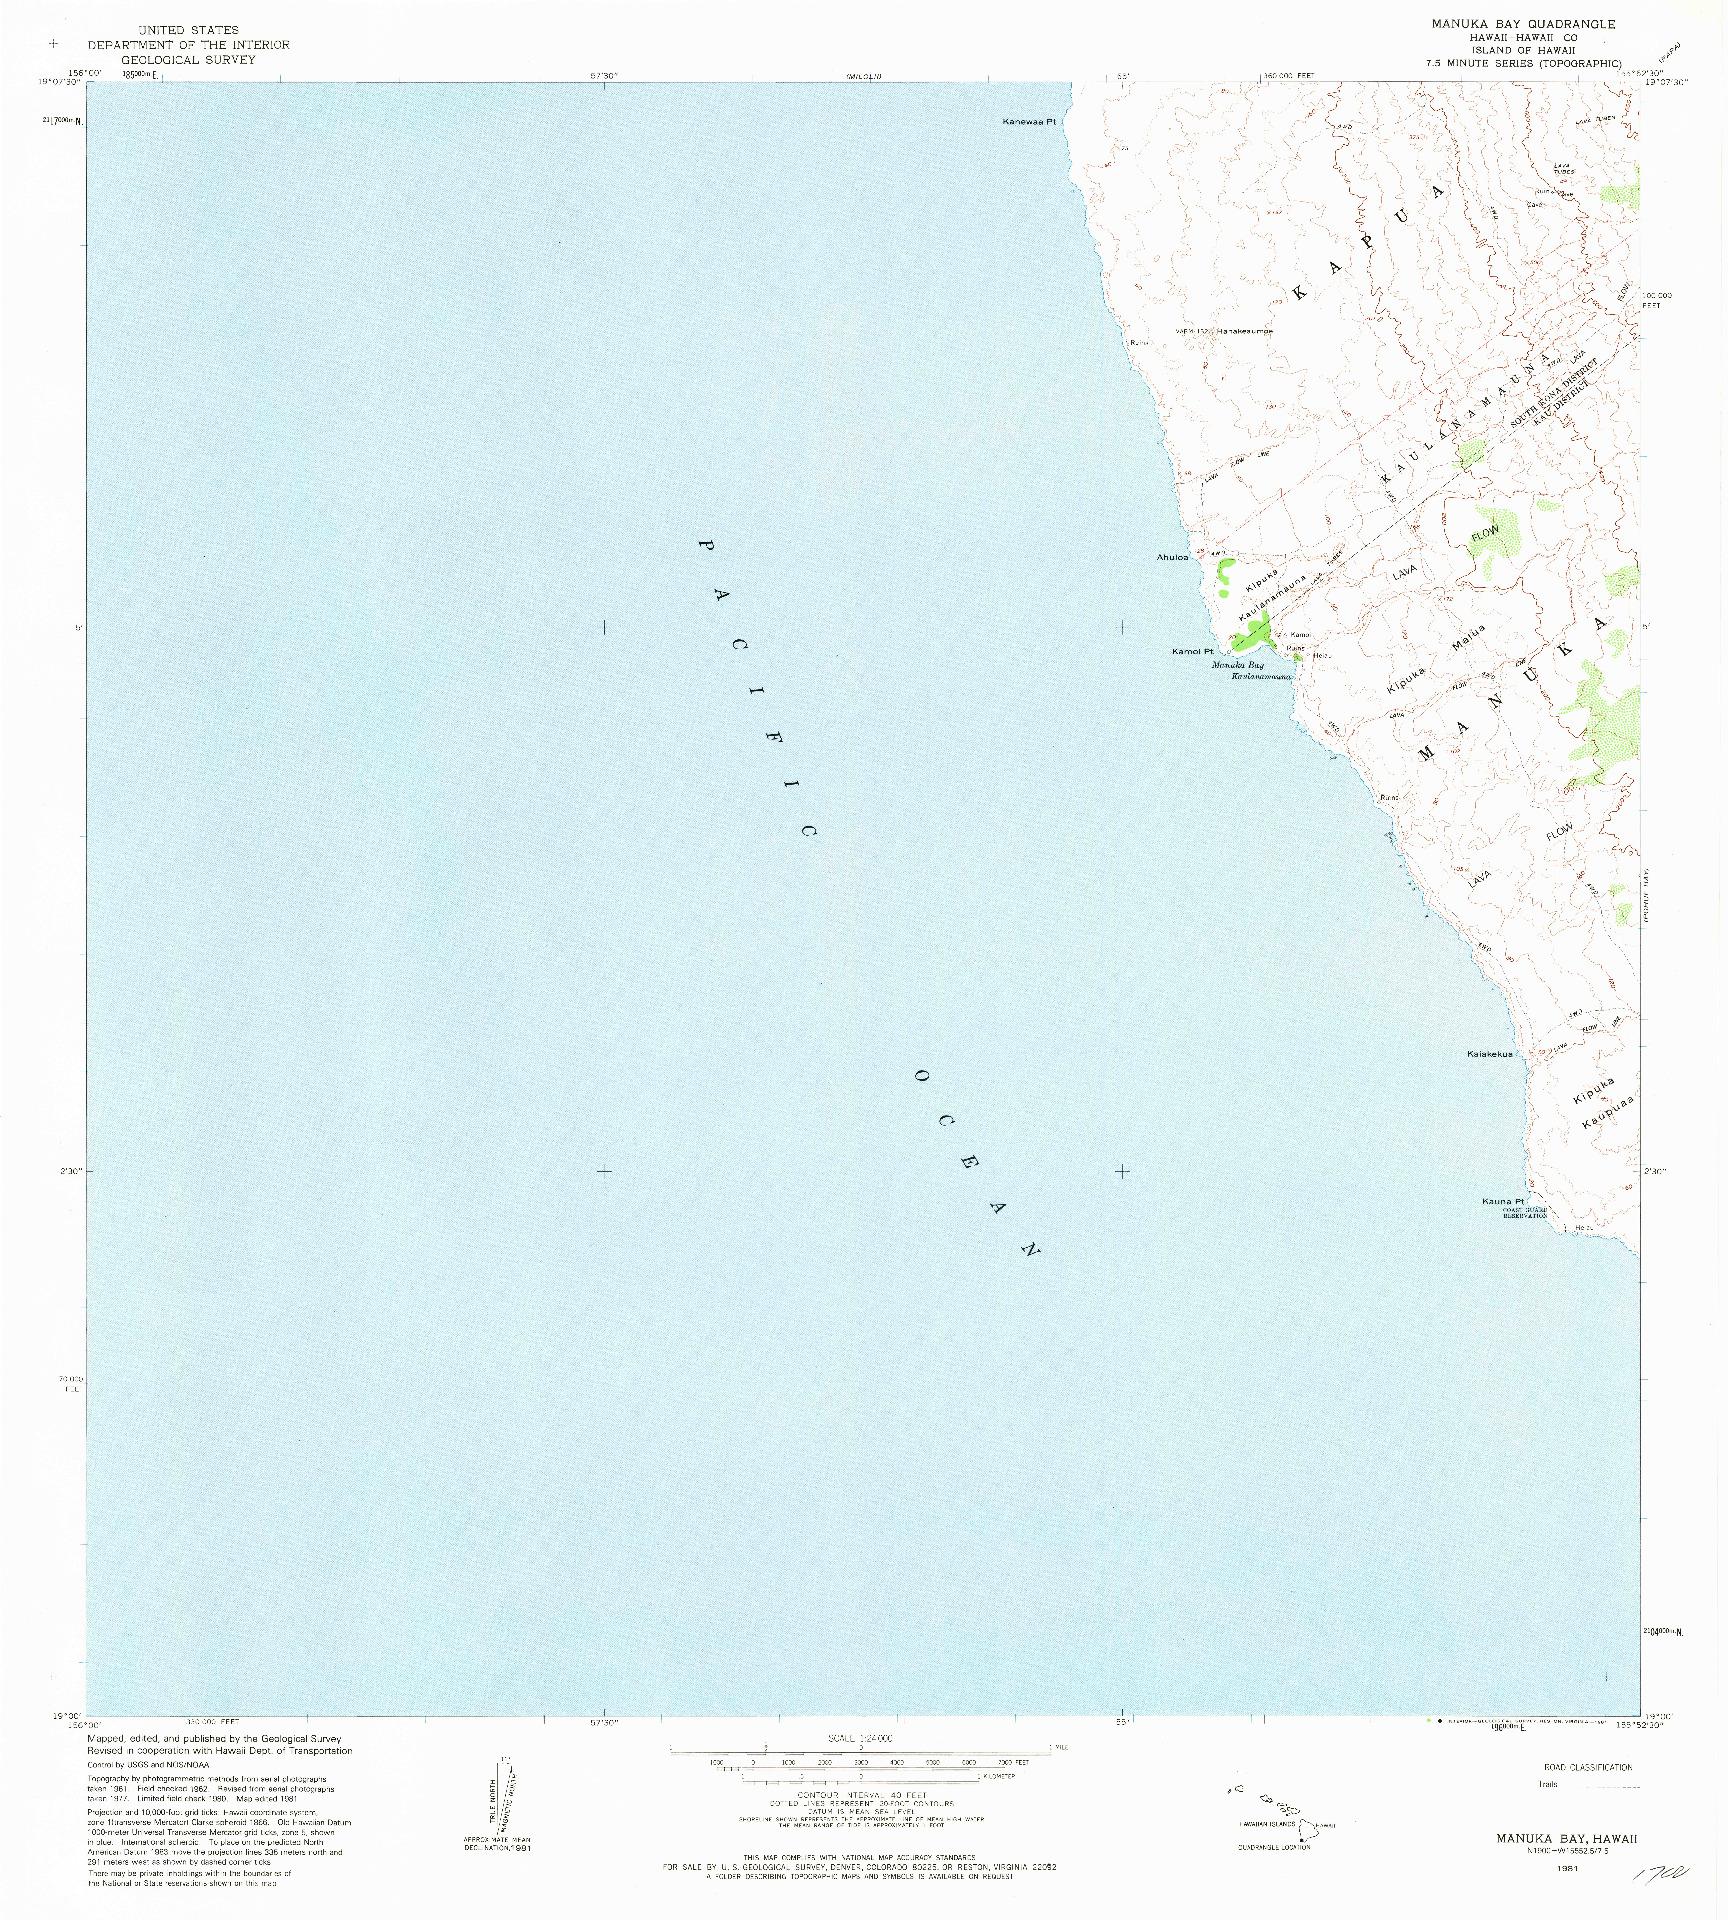 USGS 1:24000-SCALE QUADRANGLE FOR MANUKA BAY, HI 1981